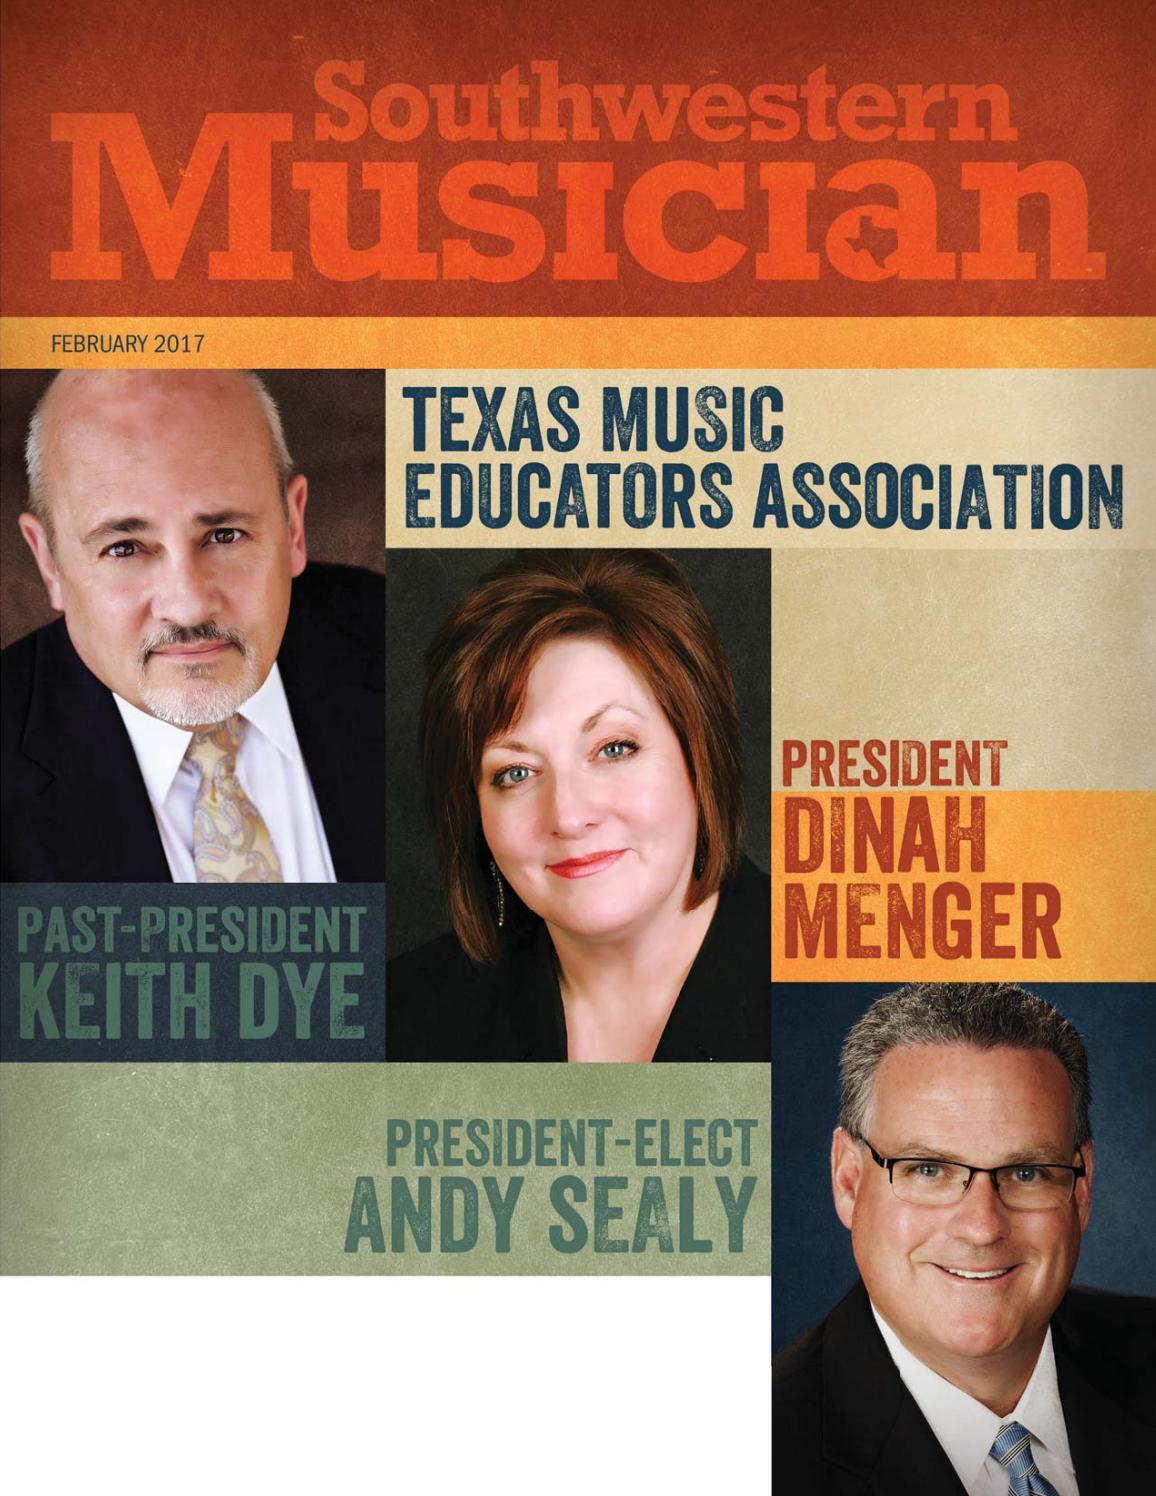 February 2017 Southwestern Musician by Texas Music Educators